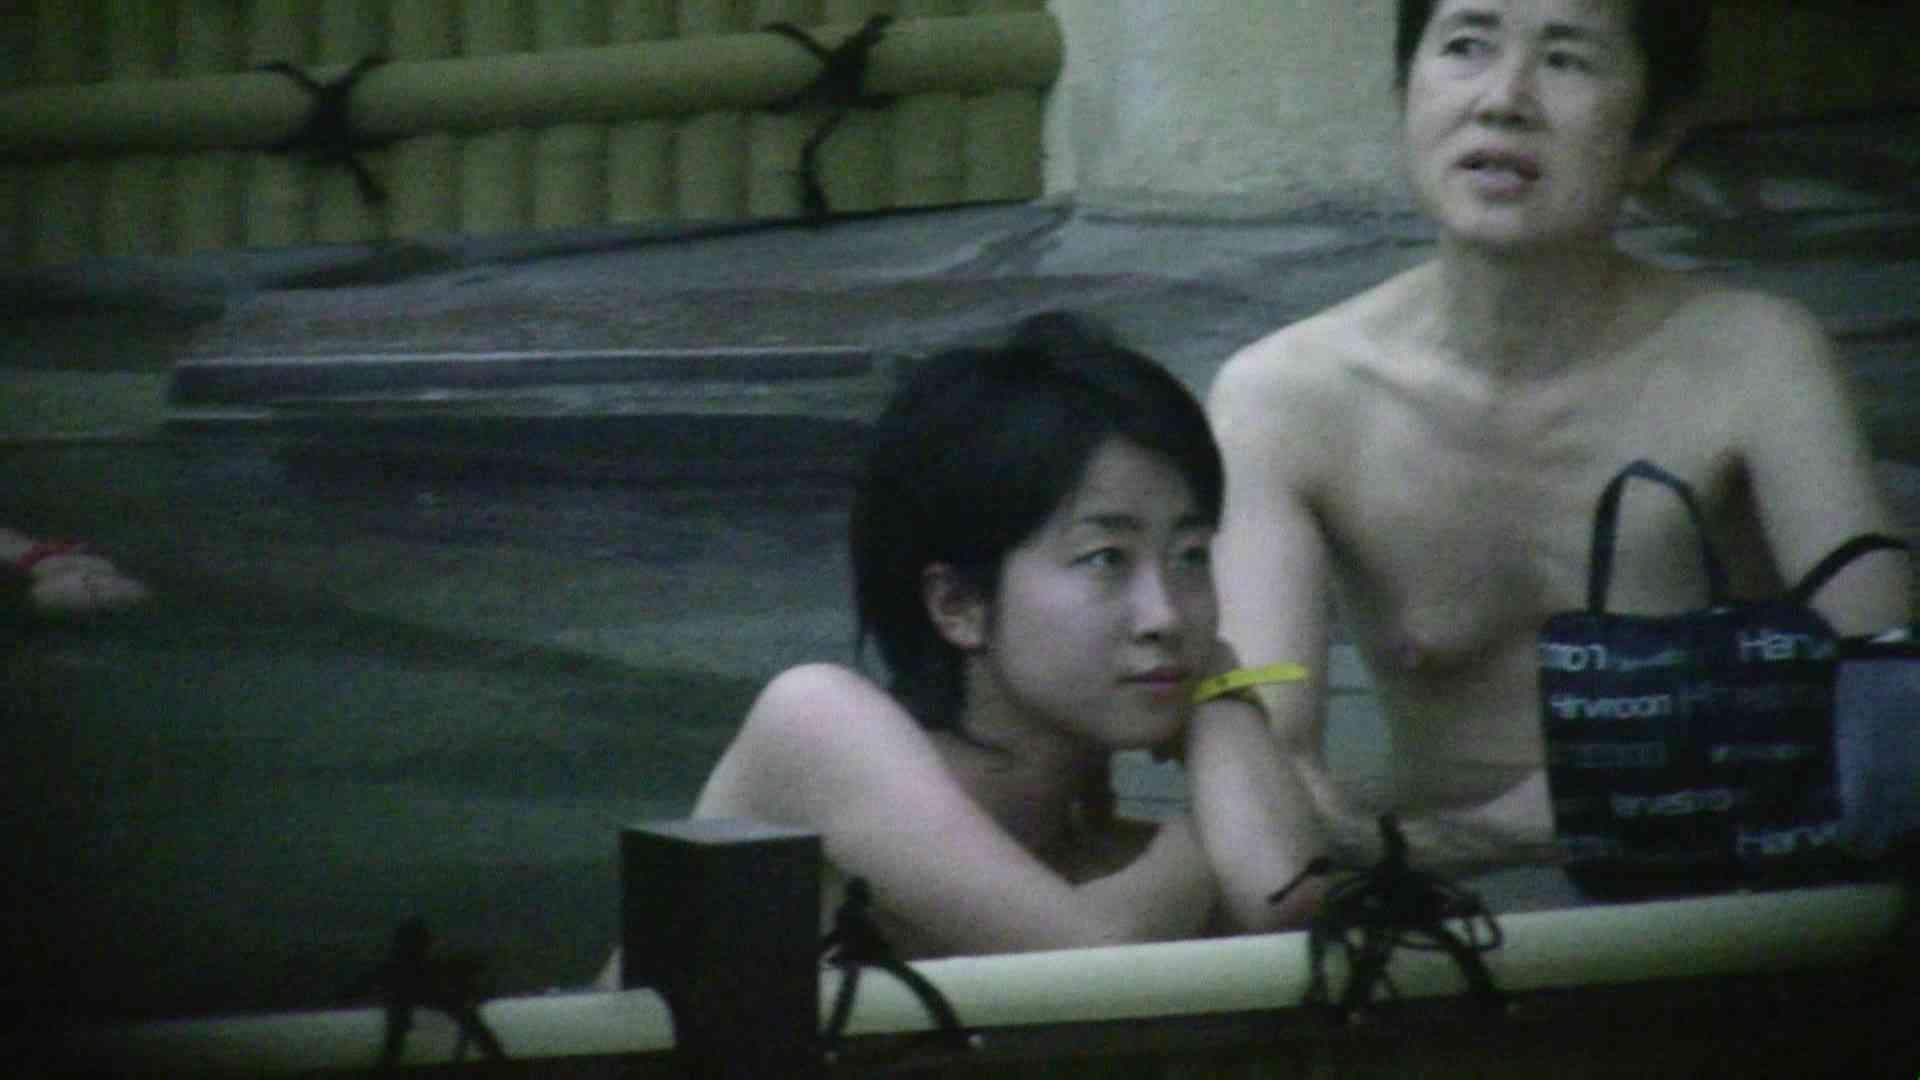 Aquaな露天風呂Vol.112 盗撮シリーズ   露天風呂編  93PIX 57